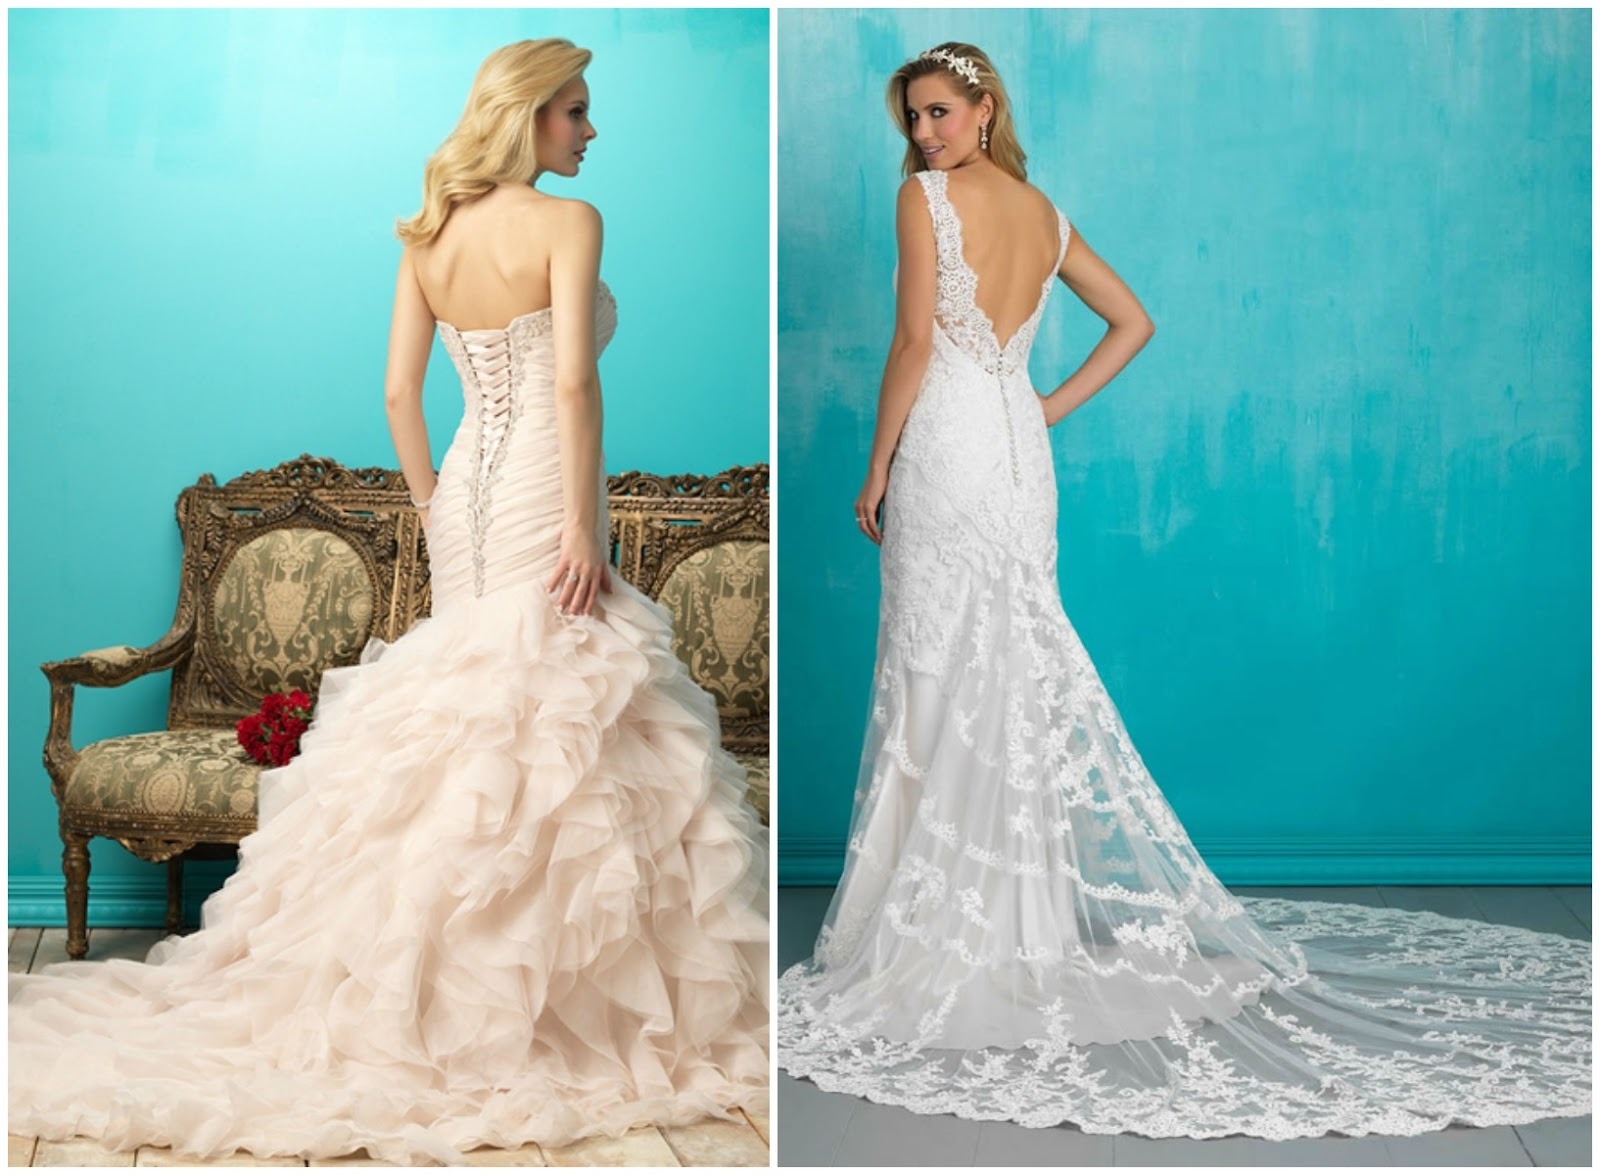 Angelus Bridal and Formal: 10 Fabulous Wedding Dress Elements We Love